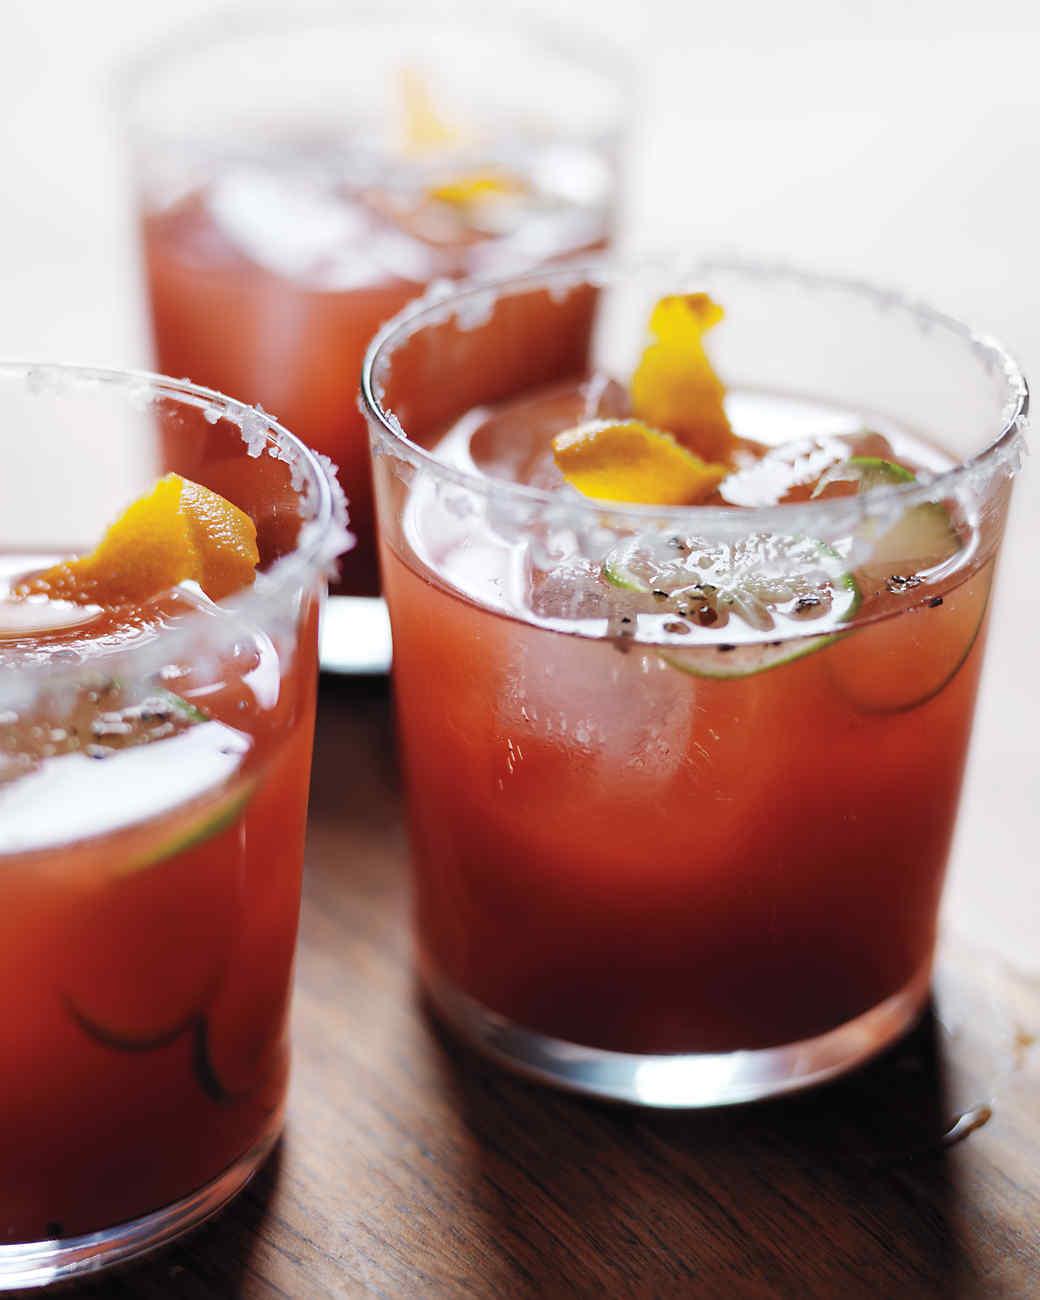 msl-drinks-0017-md109628.jpg